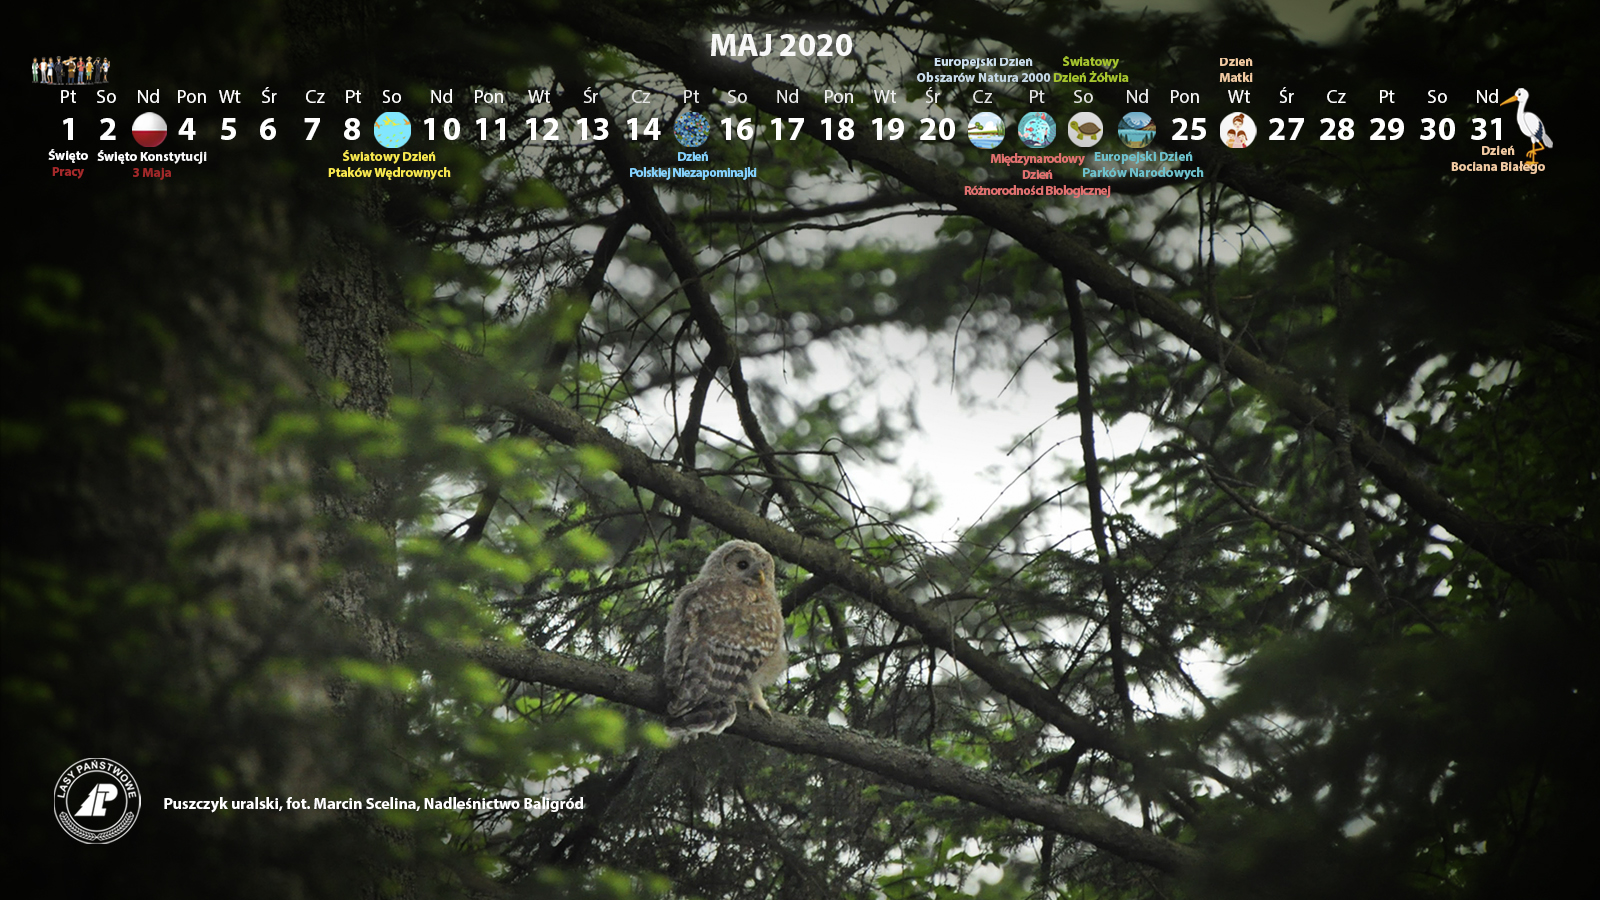 Kalendarz_maj_2020_1600x900[1].jpg